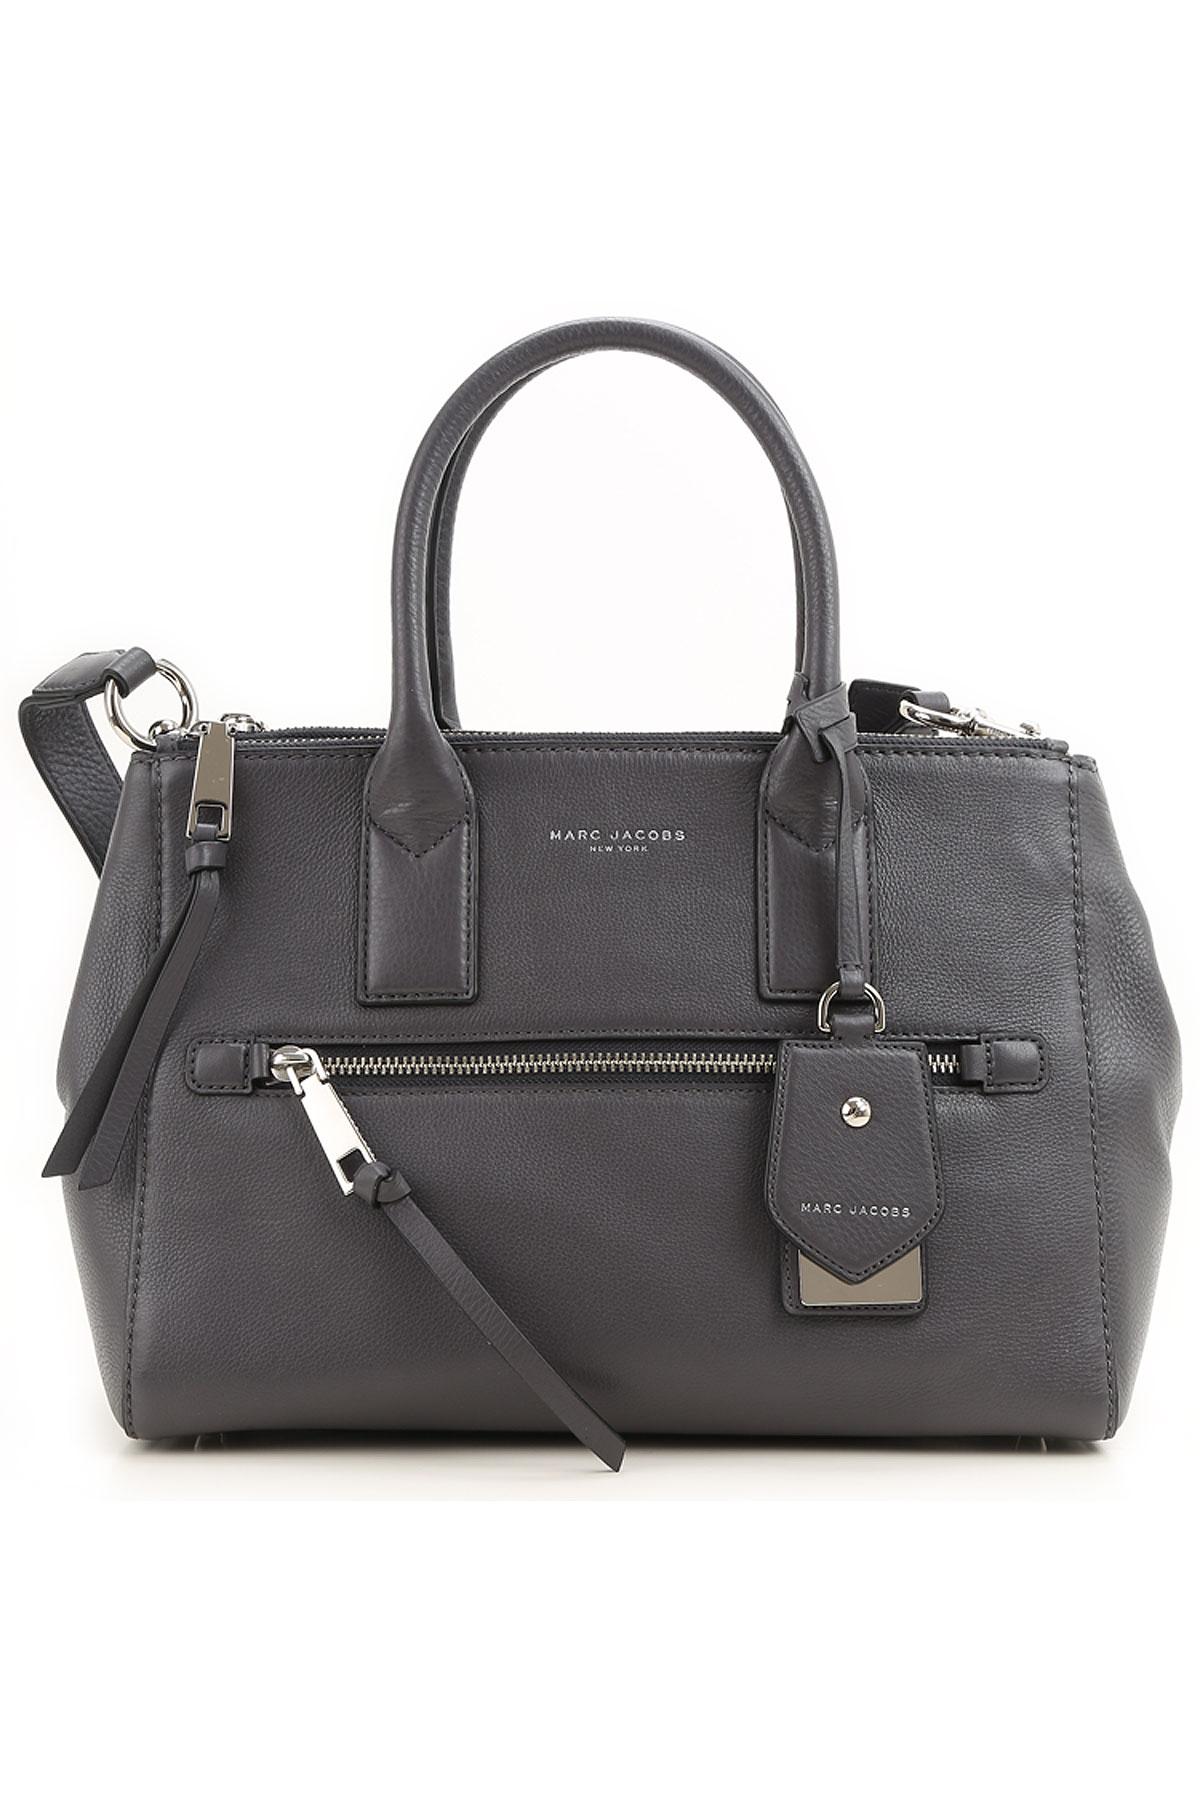 Marc Jacobs Tote Bag, Dark Grey, Leather, 2017